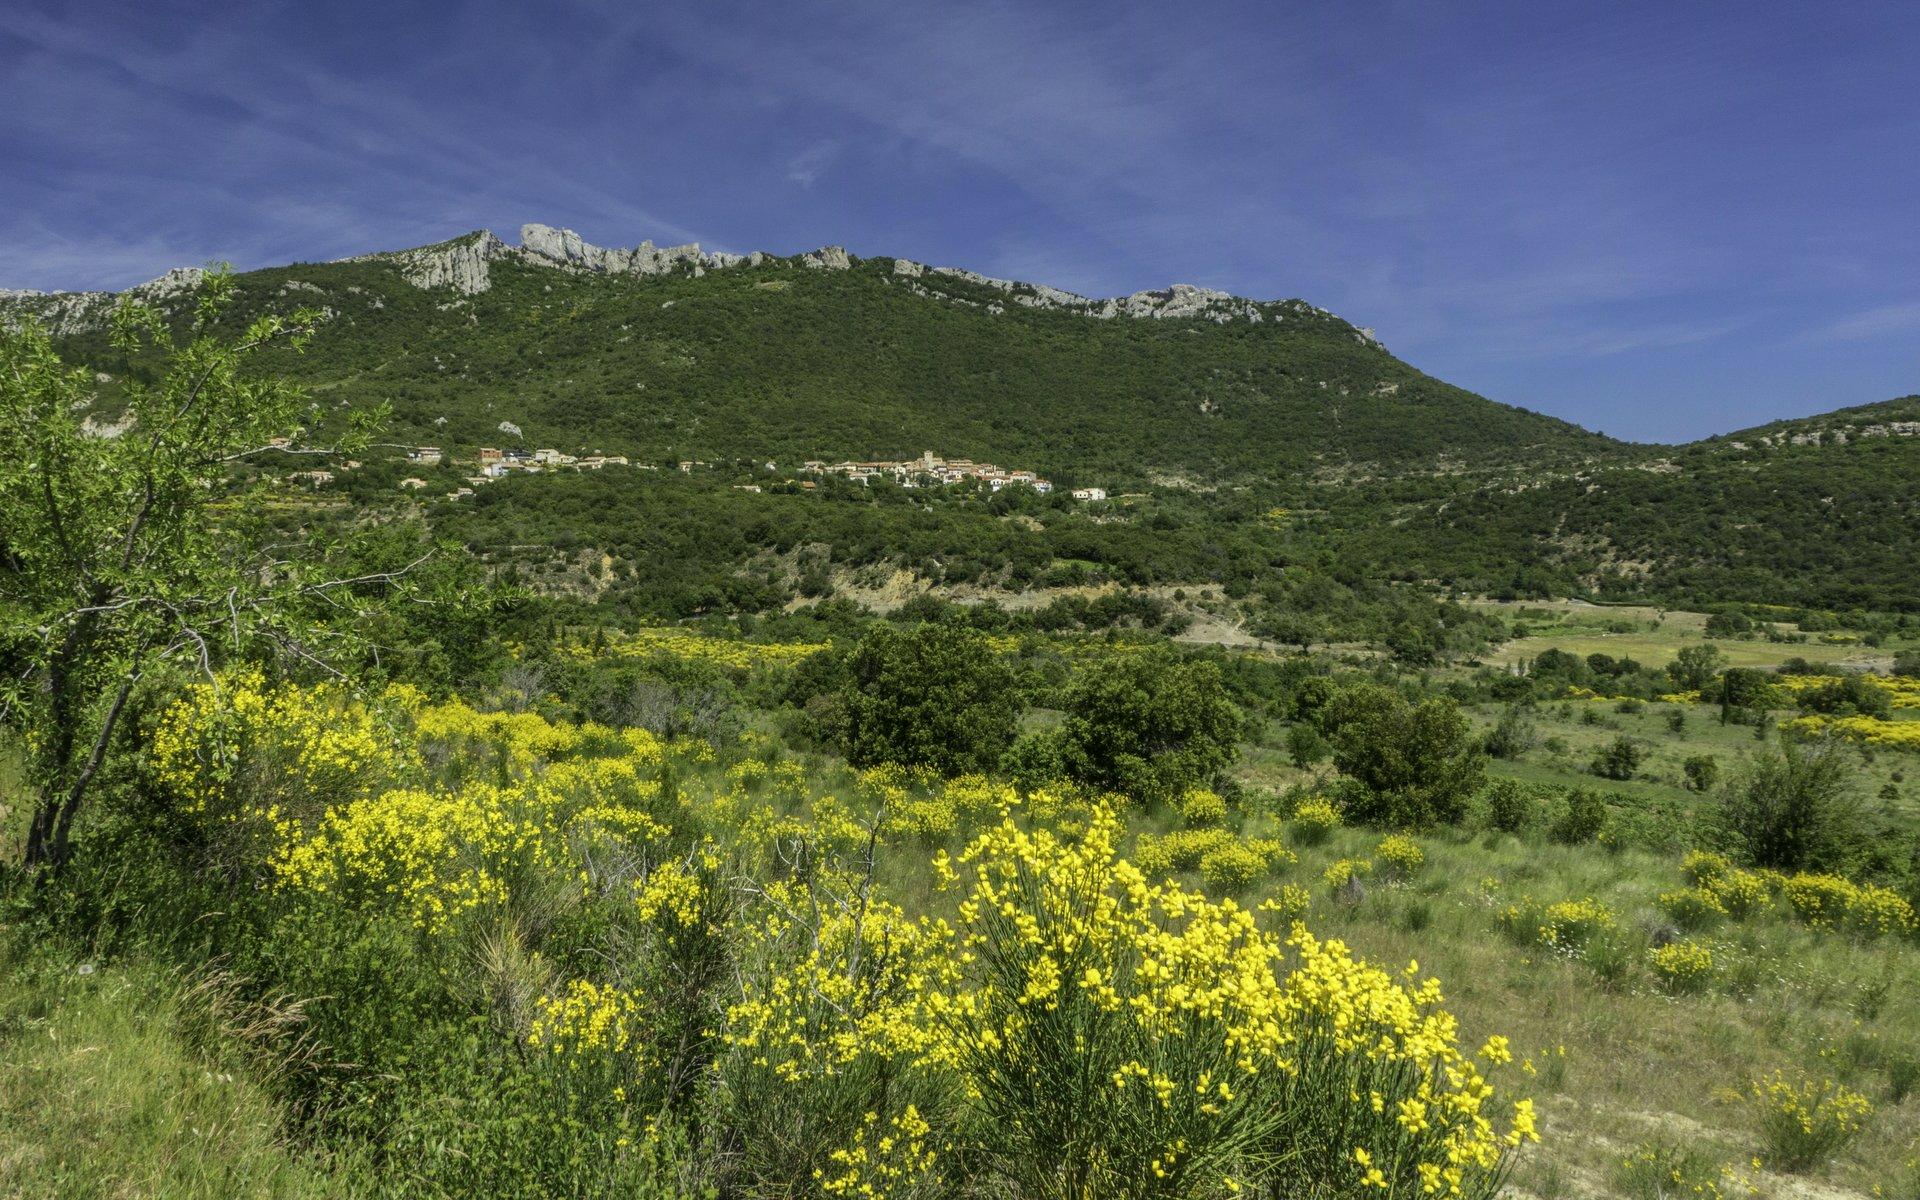 Blick auf Duilhac-sous-Peyrepertuse und Château de Peyrepertuse von der Straße nach Cucugnan